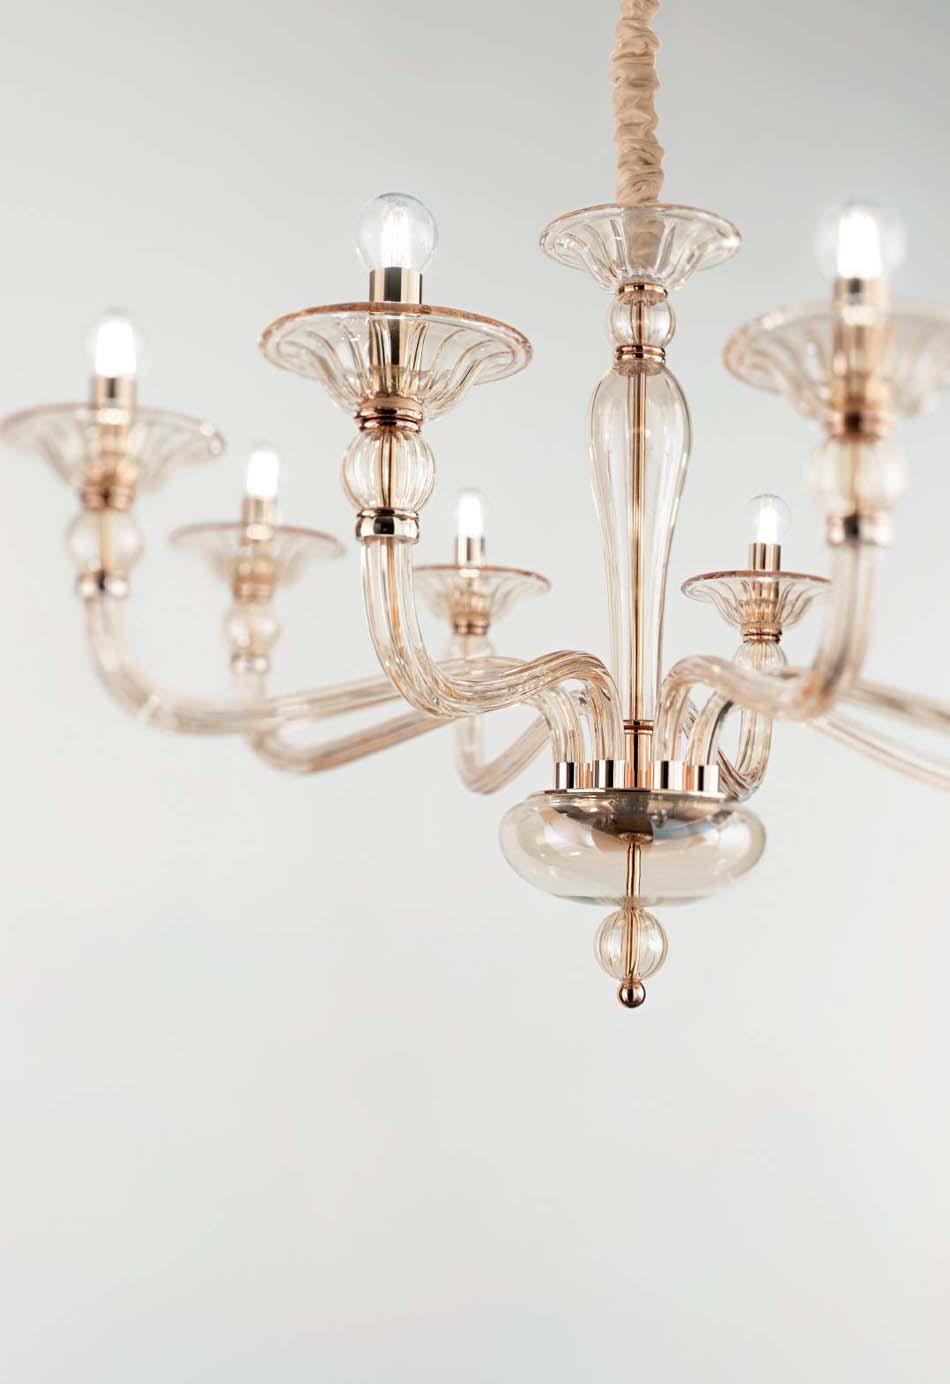 Lampade 43 sospese vintage Ideal Lux danieli – Toscana Arredamenti